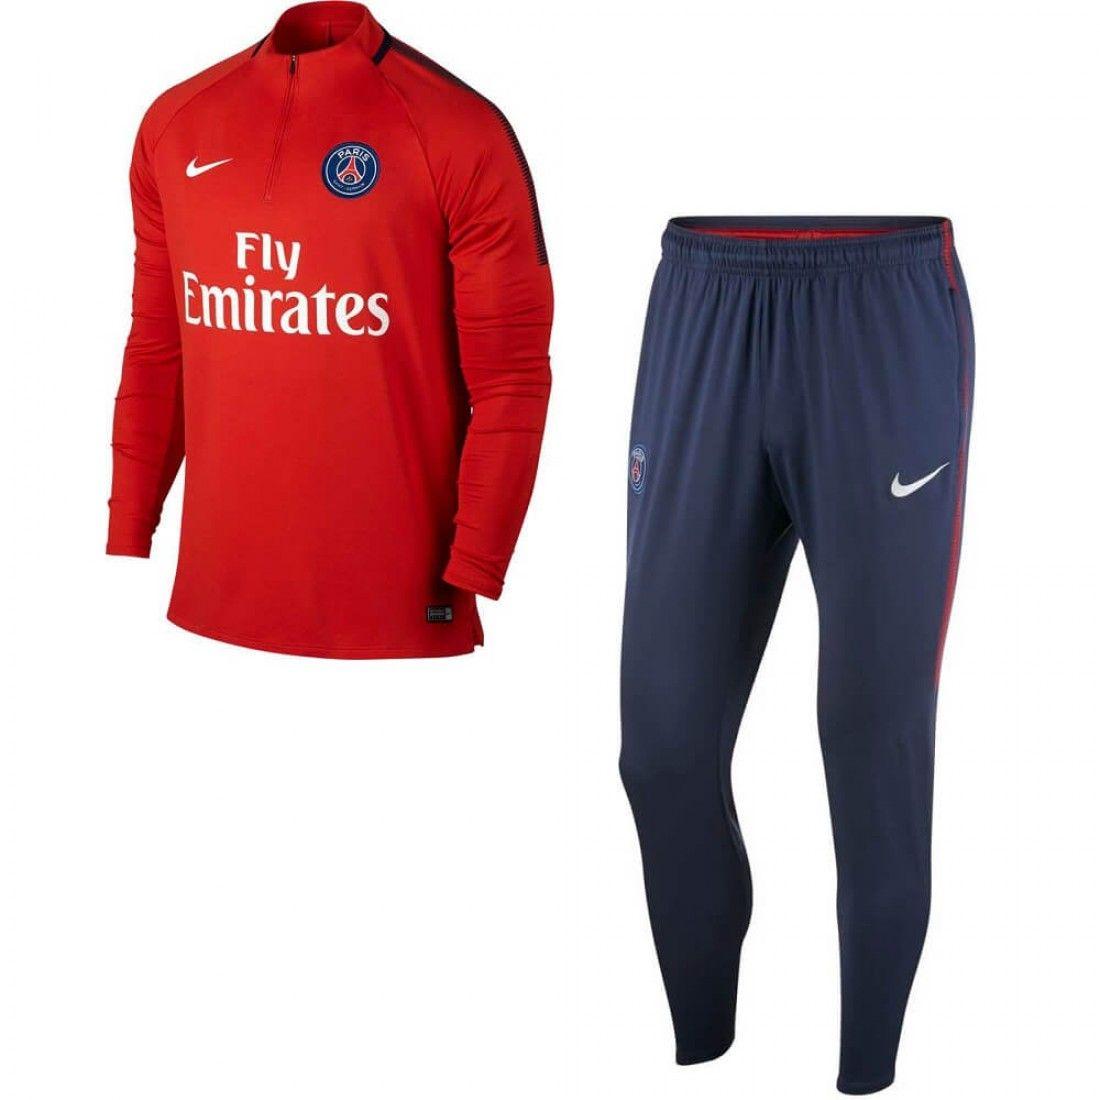 Nike Performance Paris Saint-Germain  Club Wear Bleu Fonc